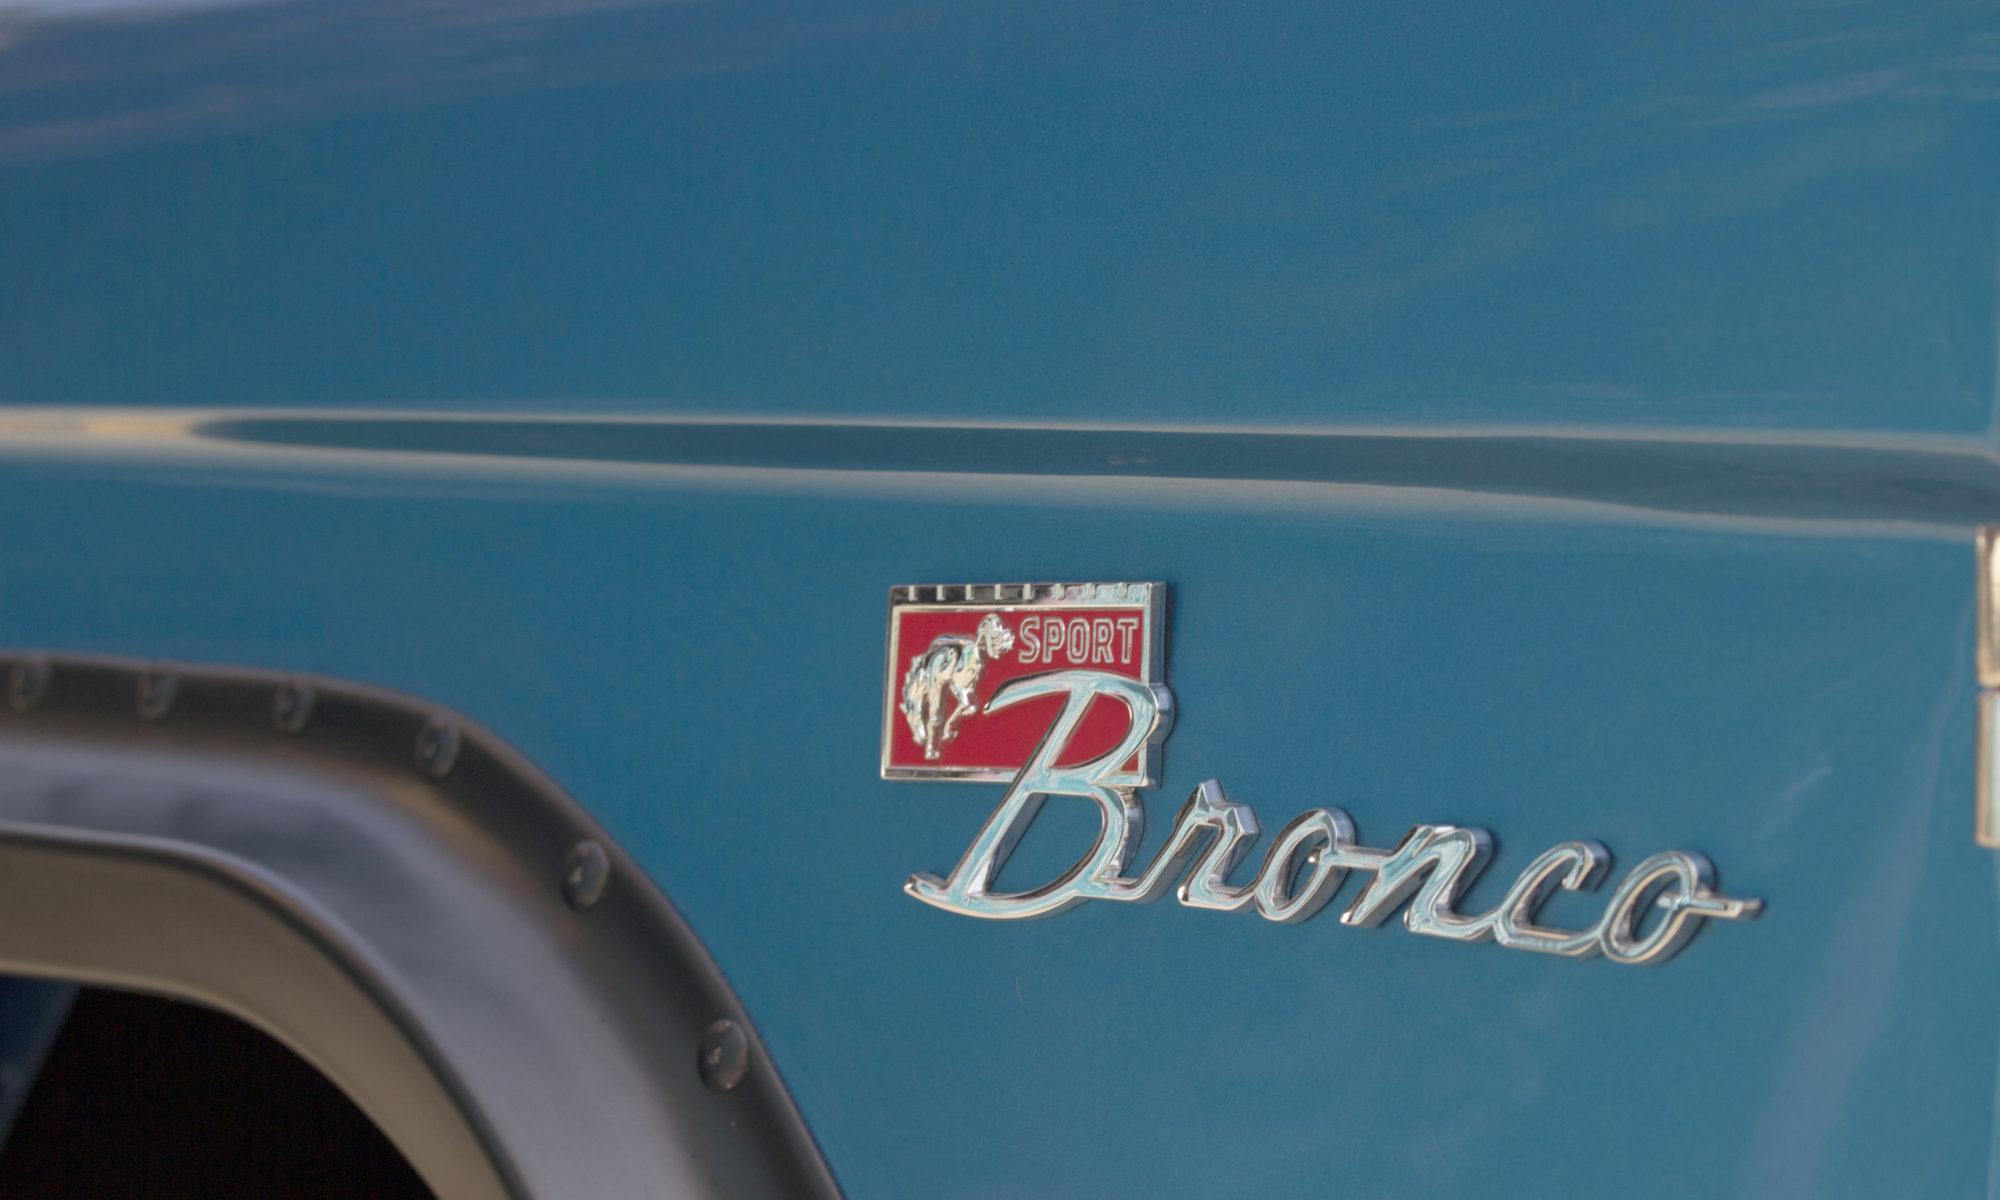 Bronco Services: Restoration